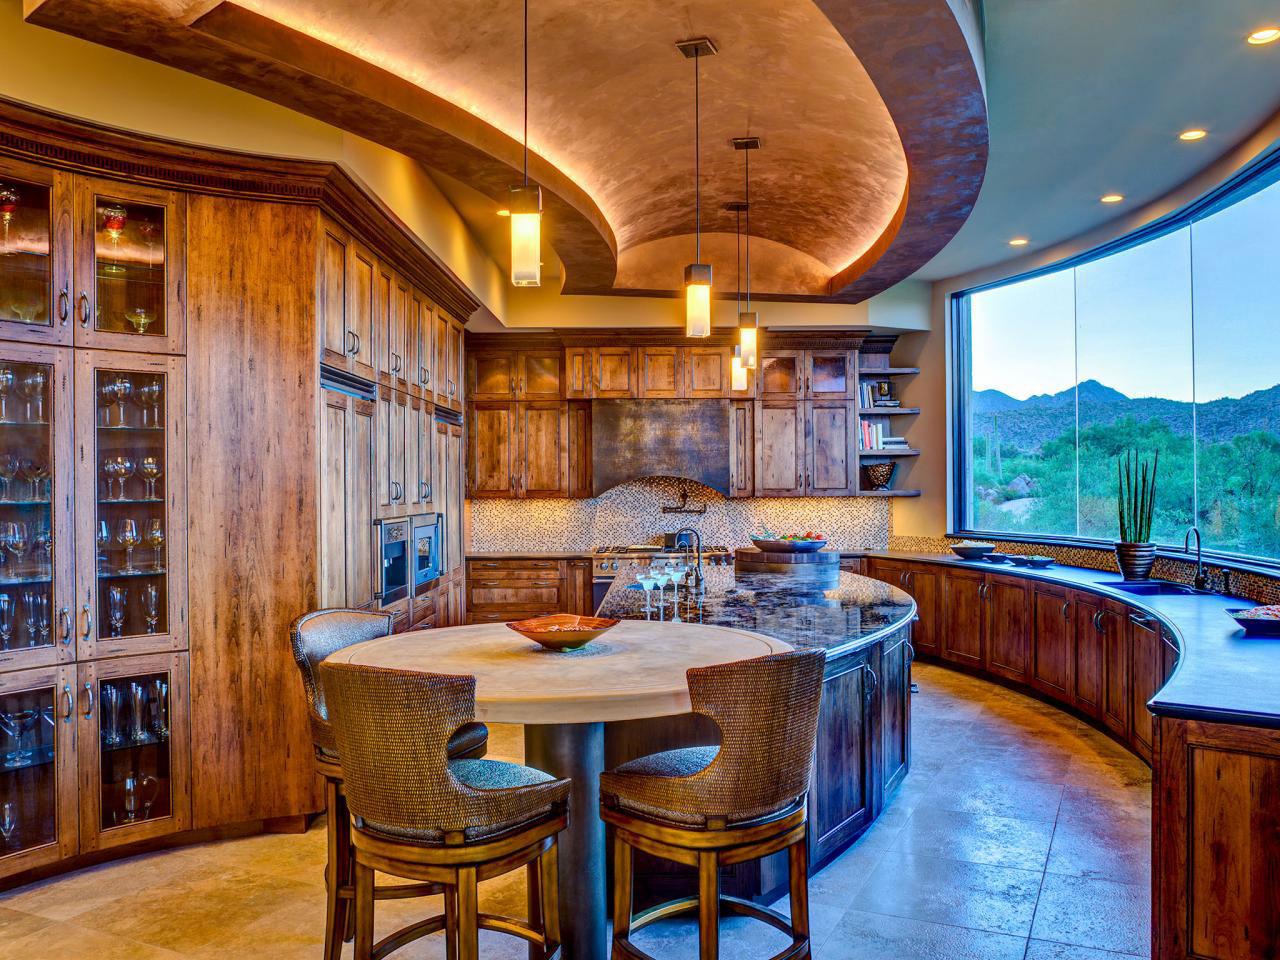 Southwestern-Interior-Design-Style-and-Decoration-Ideas-4 Southwestern Interior Design, Style and Decoration-Ideas